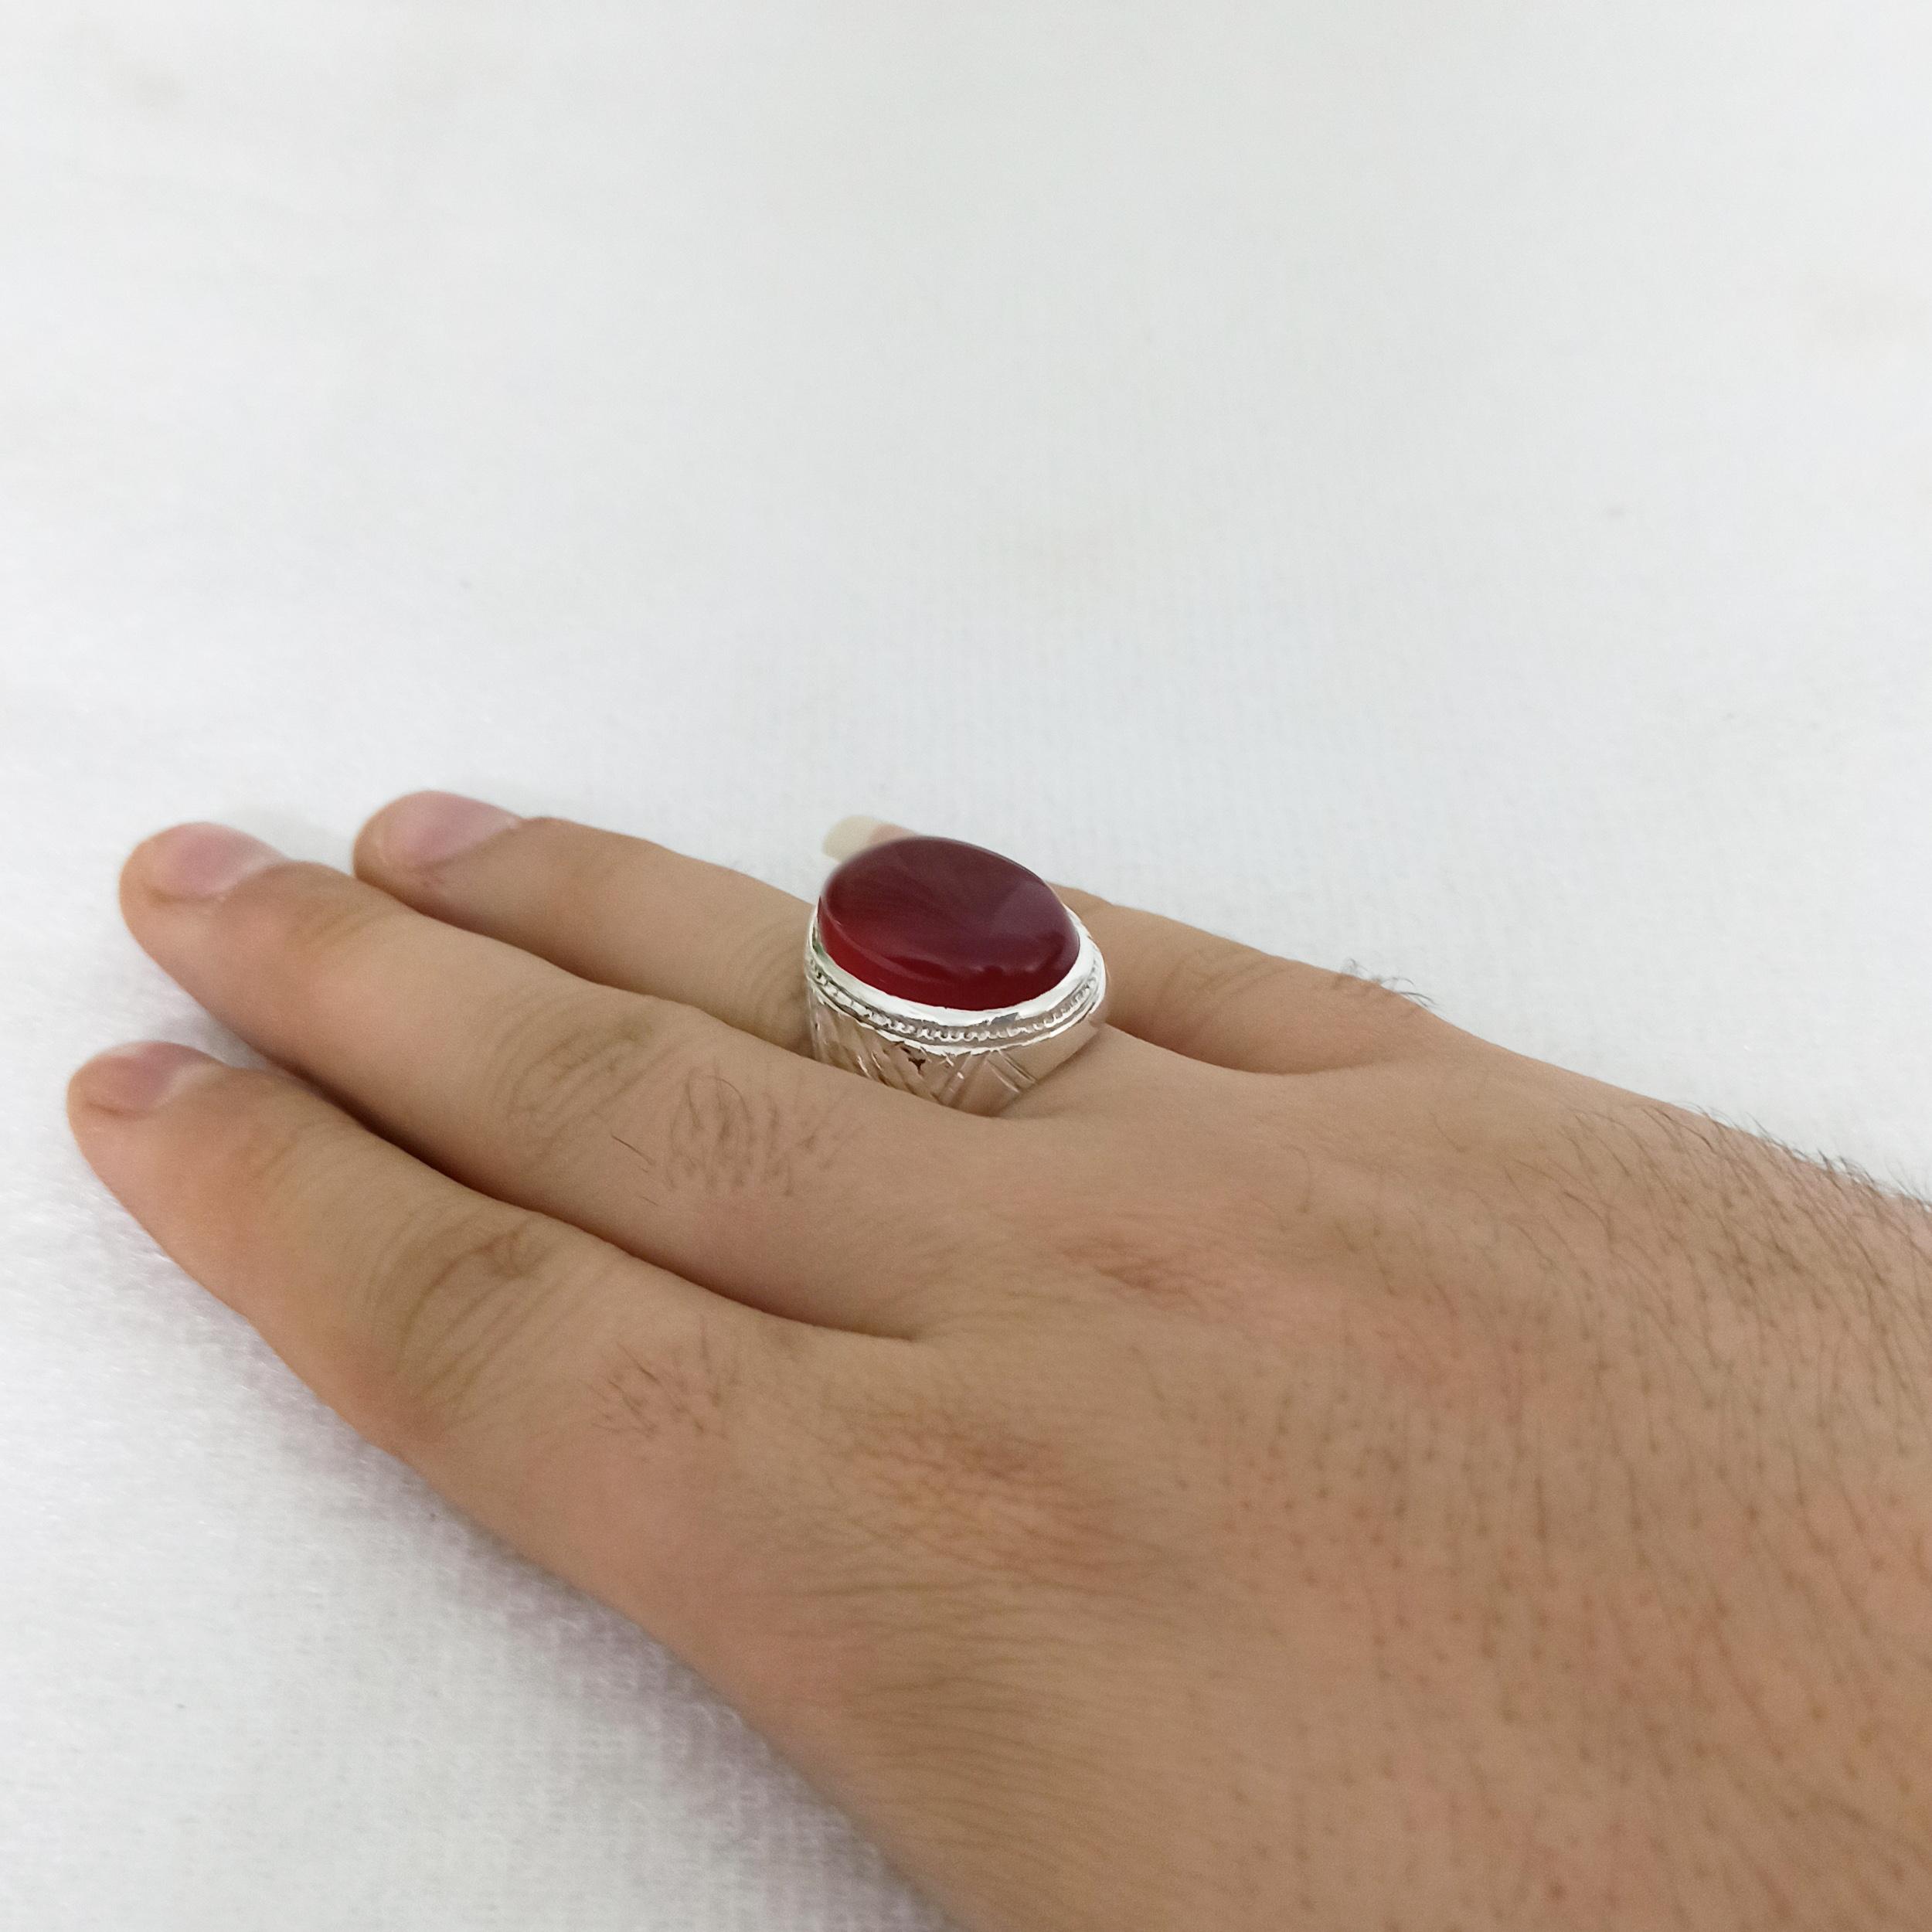 انگشتر نقره مردانه سلین کالا مدل عقیق یمن کد ce-anma35